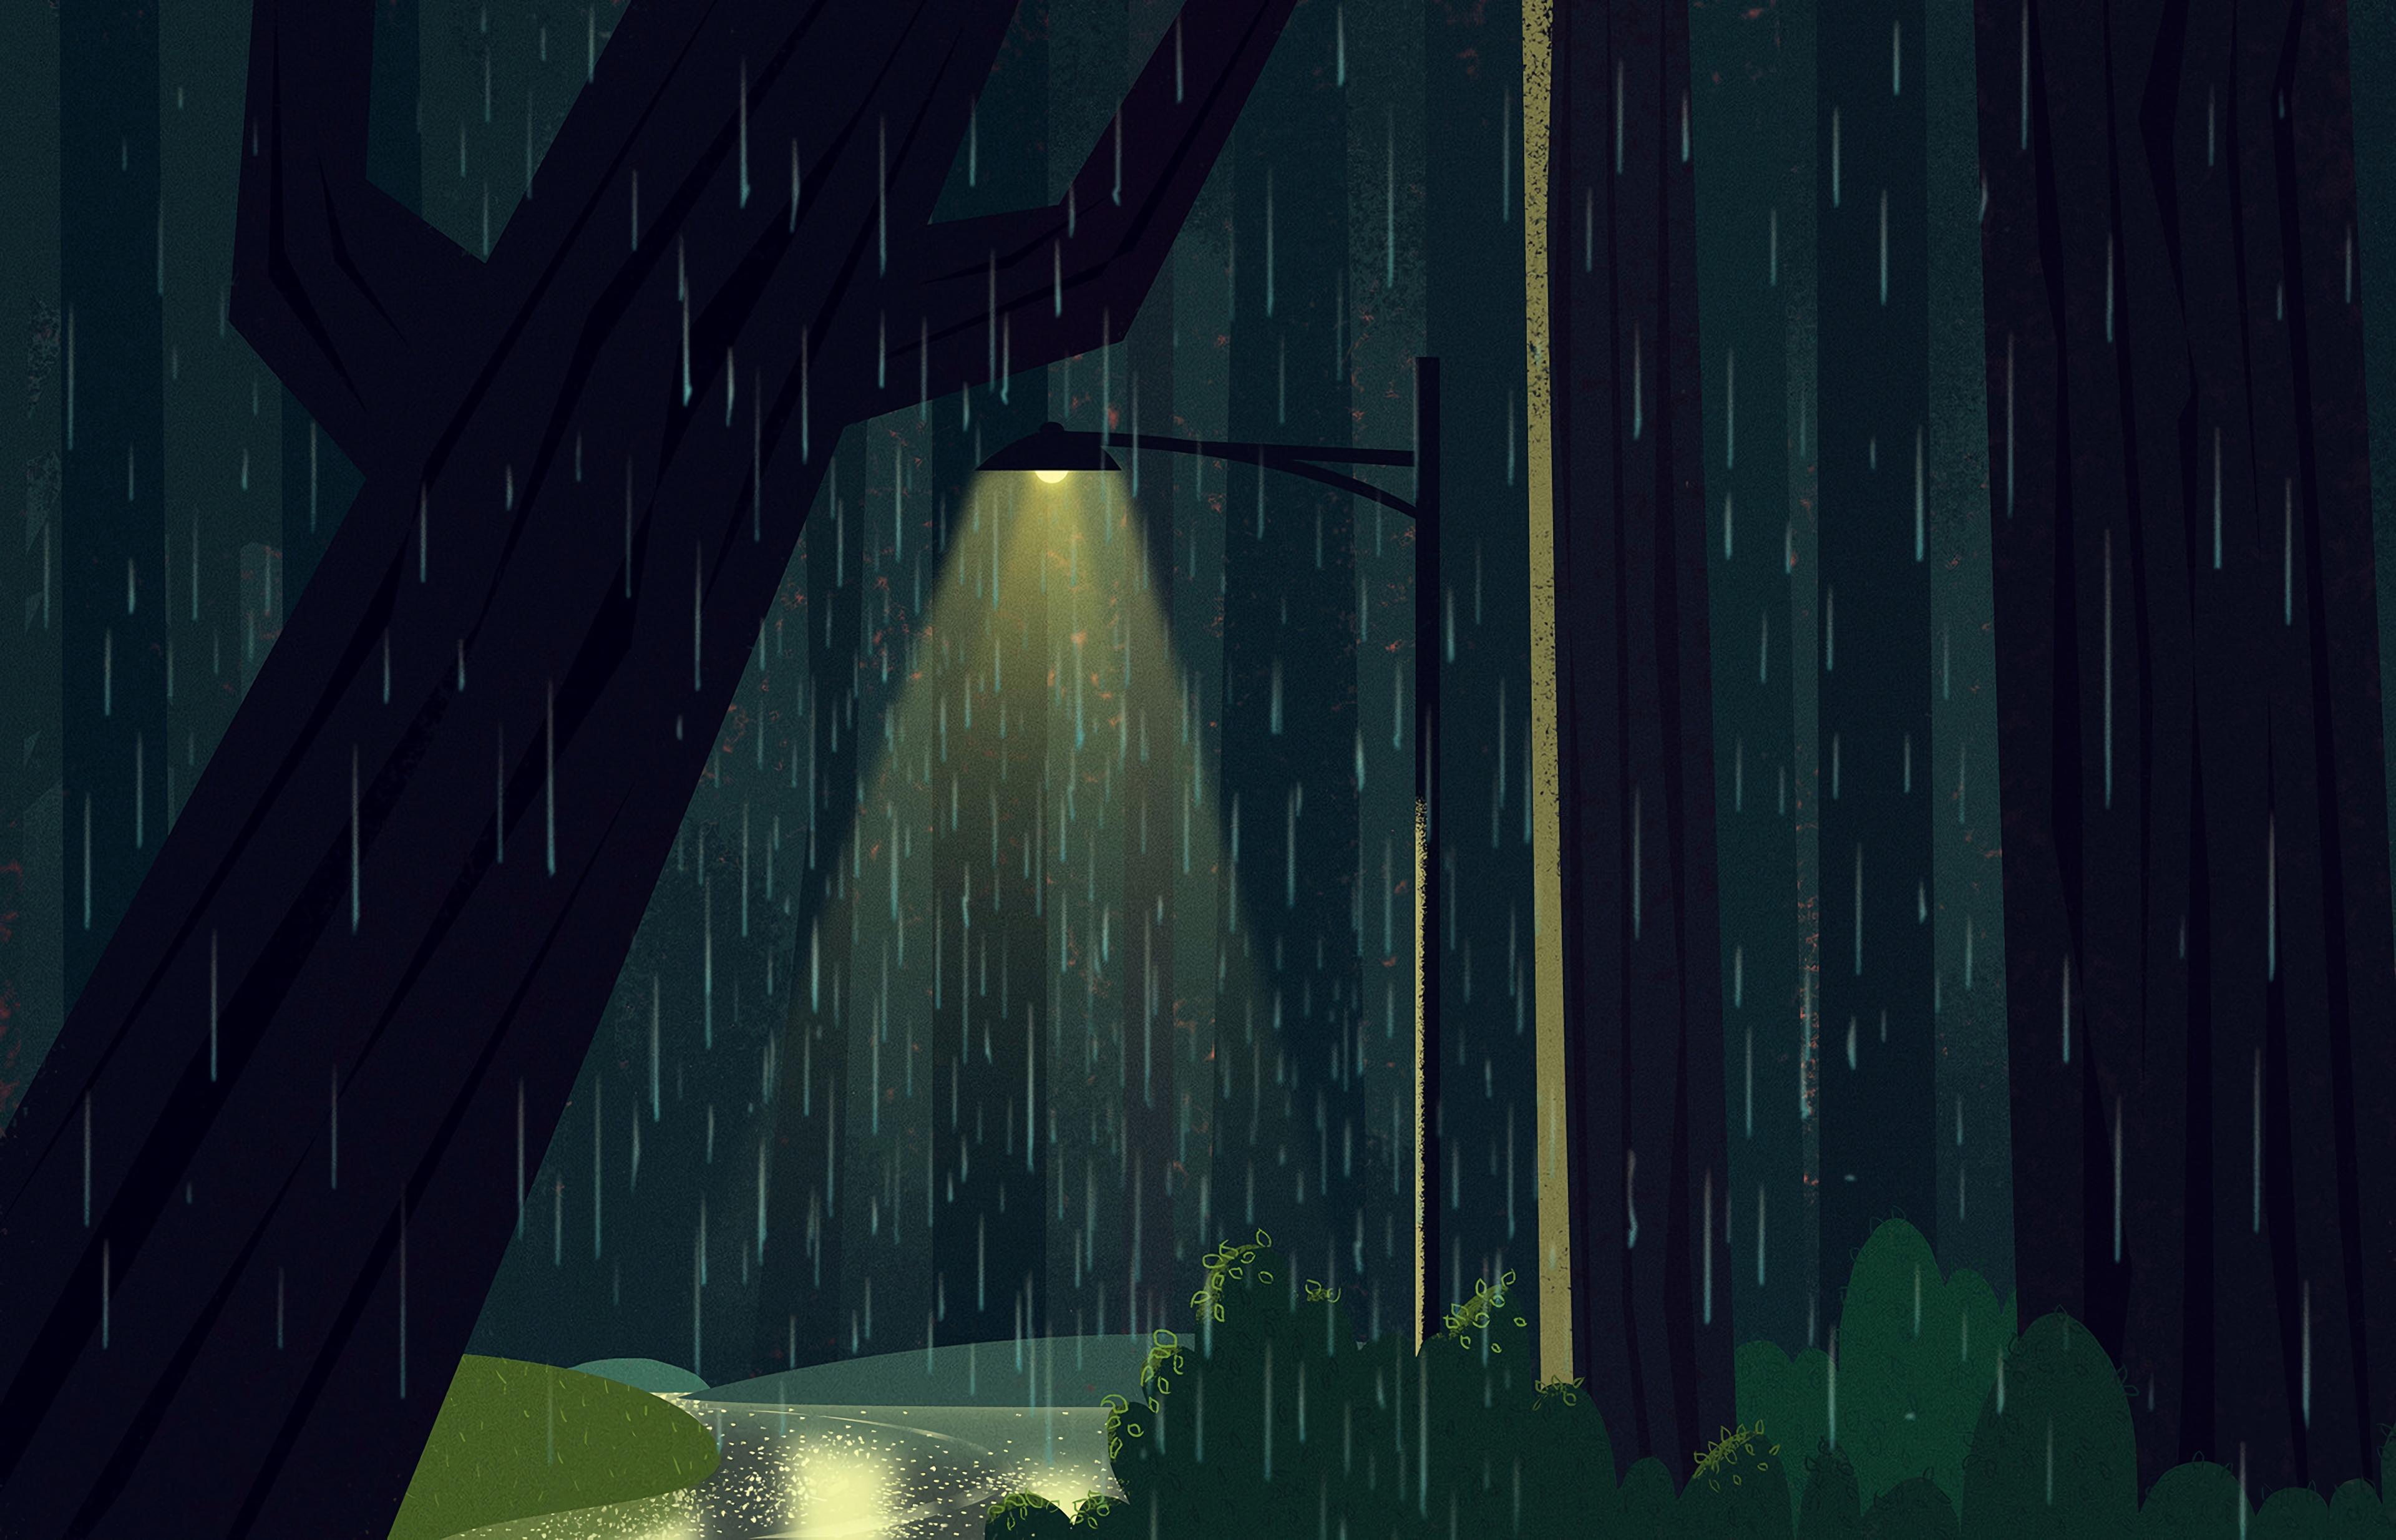 150120 download wallpaper Lamp, Lantern, Glow, Rain, Sad, Sadly, Art screensavers and pictures for free